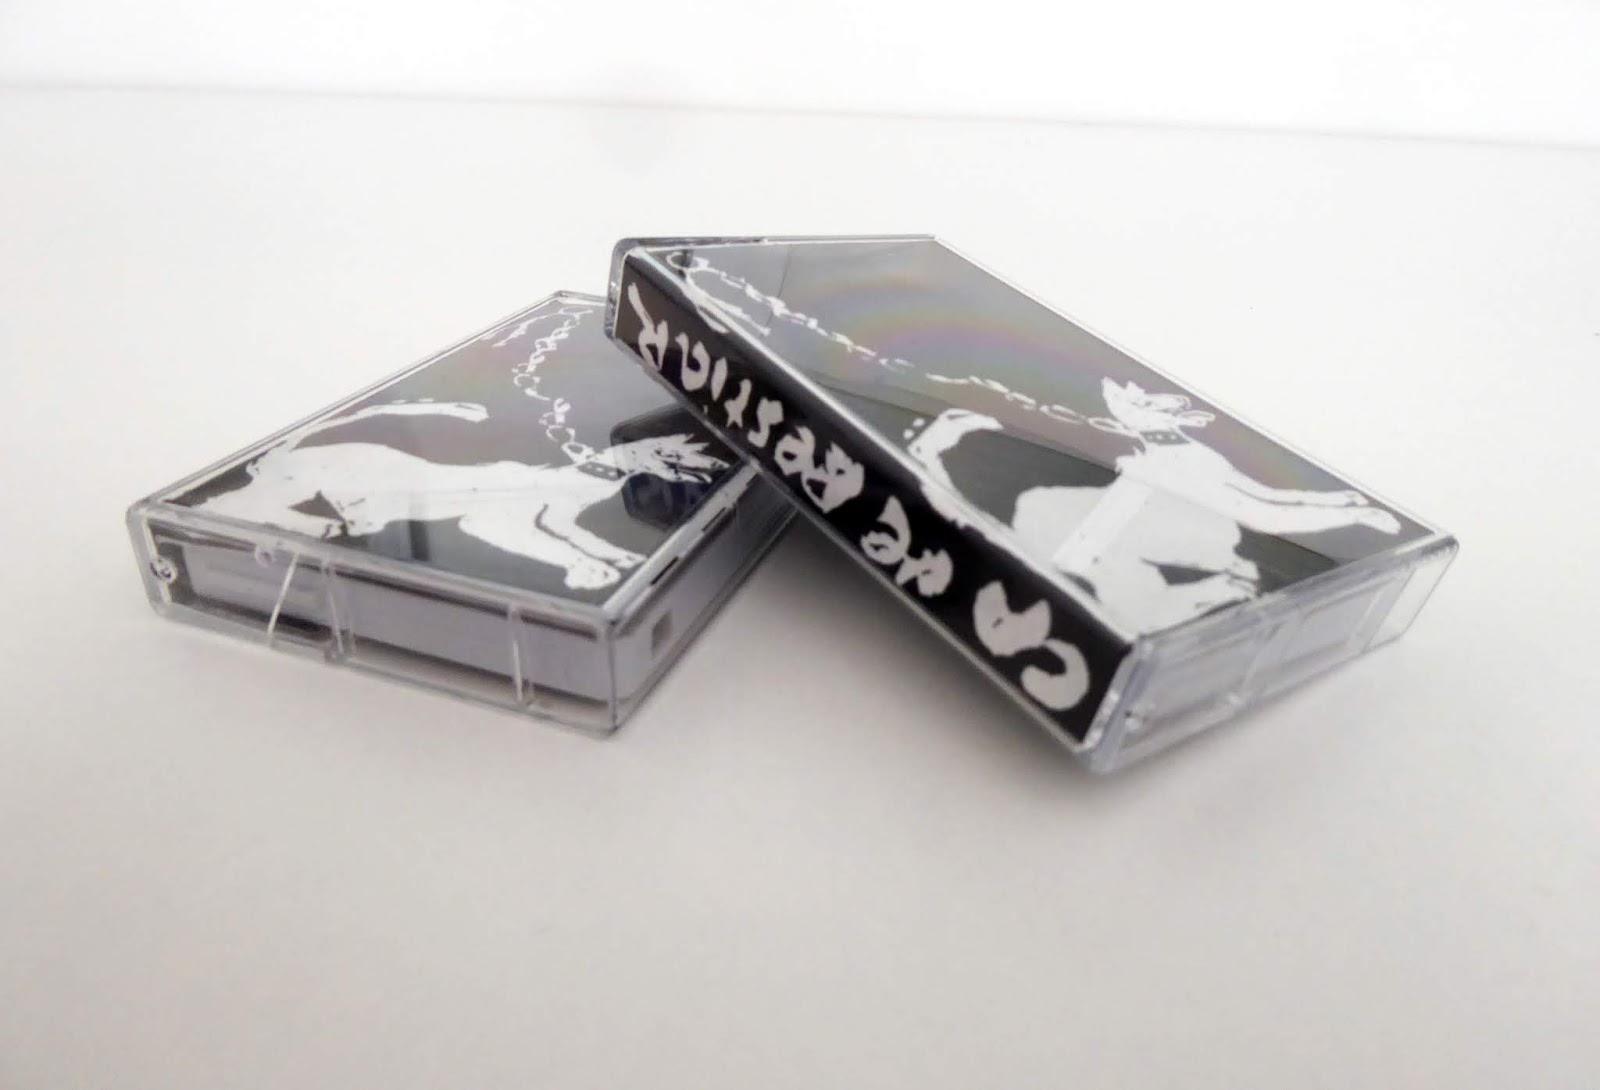 http://www.colectivolamaquina.org/2018/06/el-cassette-demo-de-ca-de-bestiar-ya.html